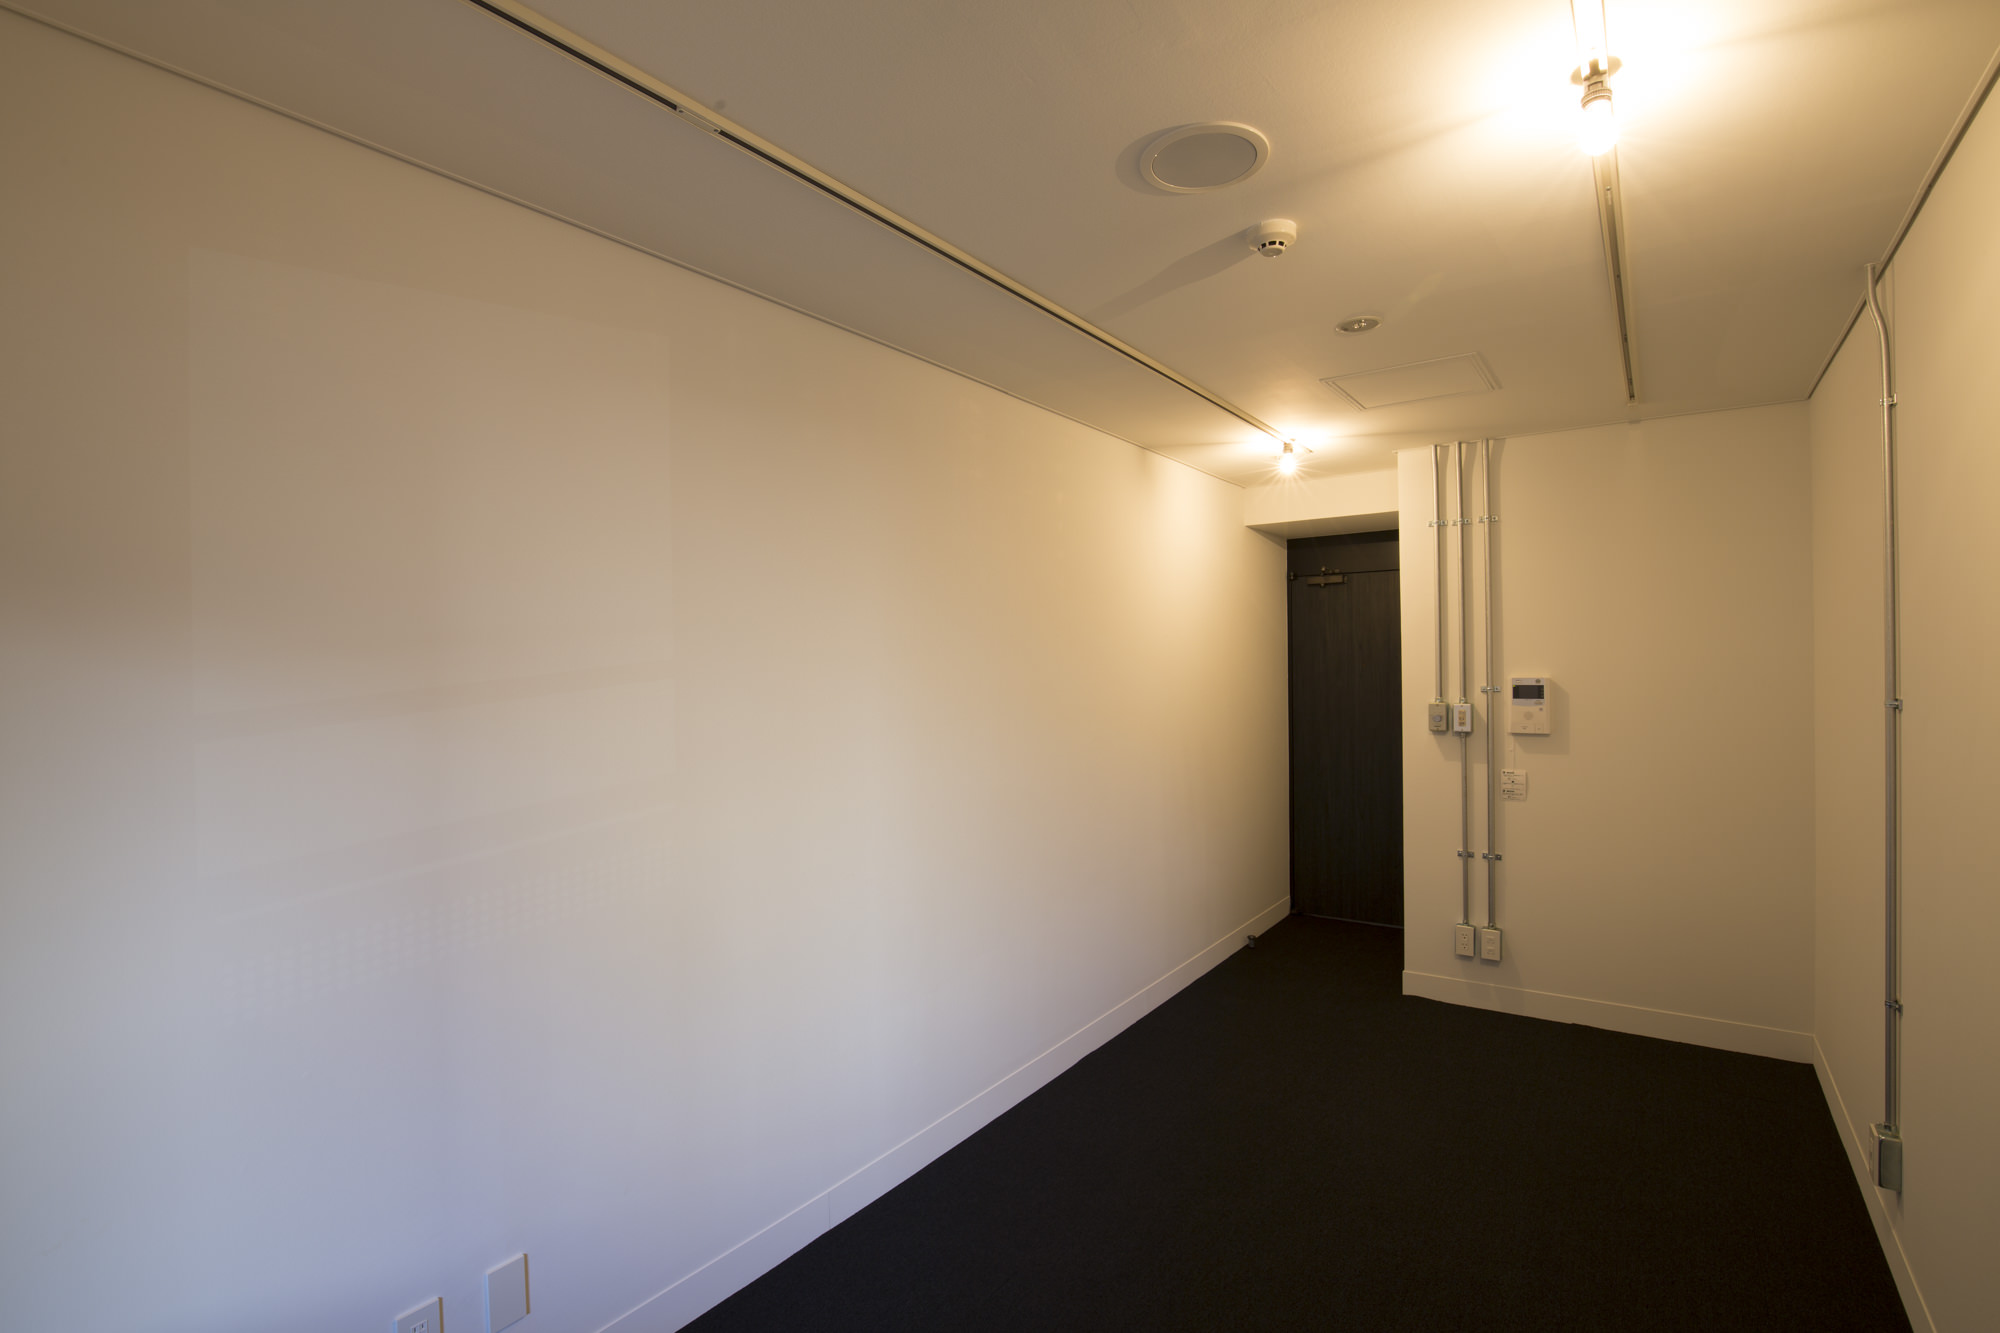 office 14㎡台~16㎡台 床:タイルカーペット 天井:有